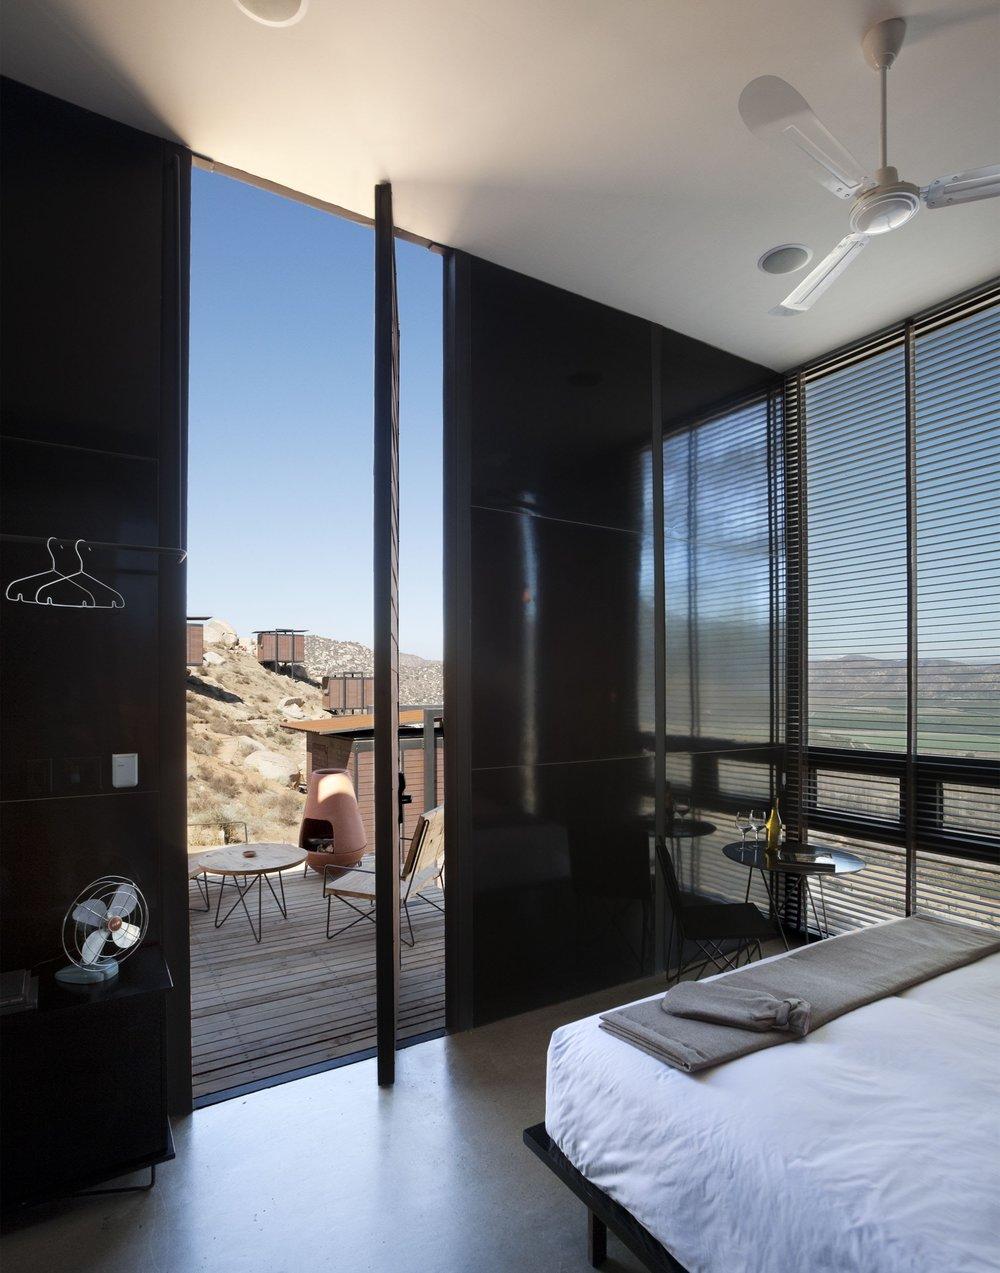 Gracia_HotelEndemico_2093b.jpg